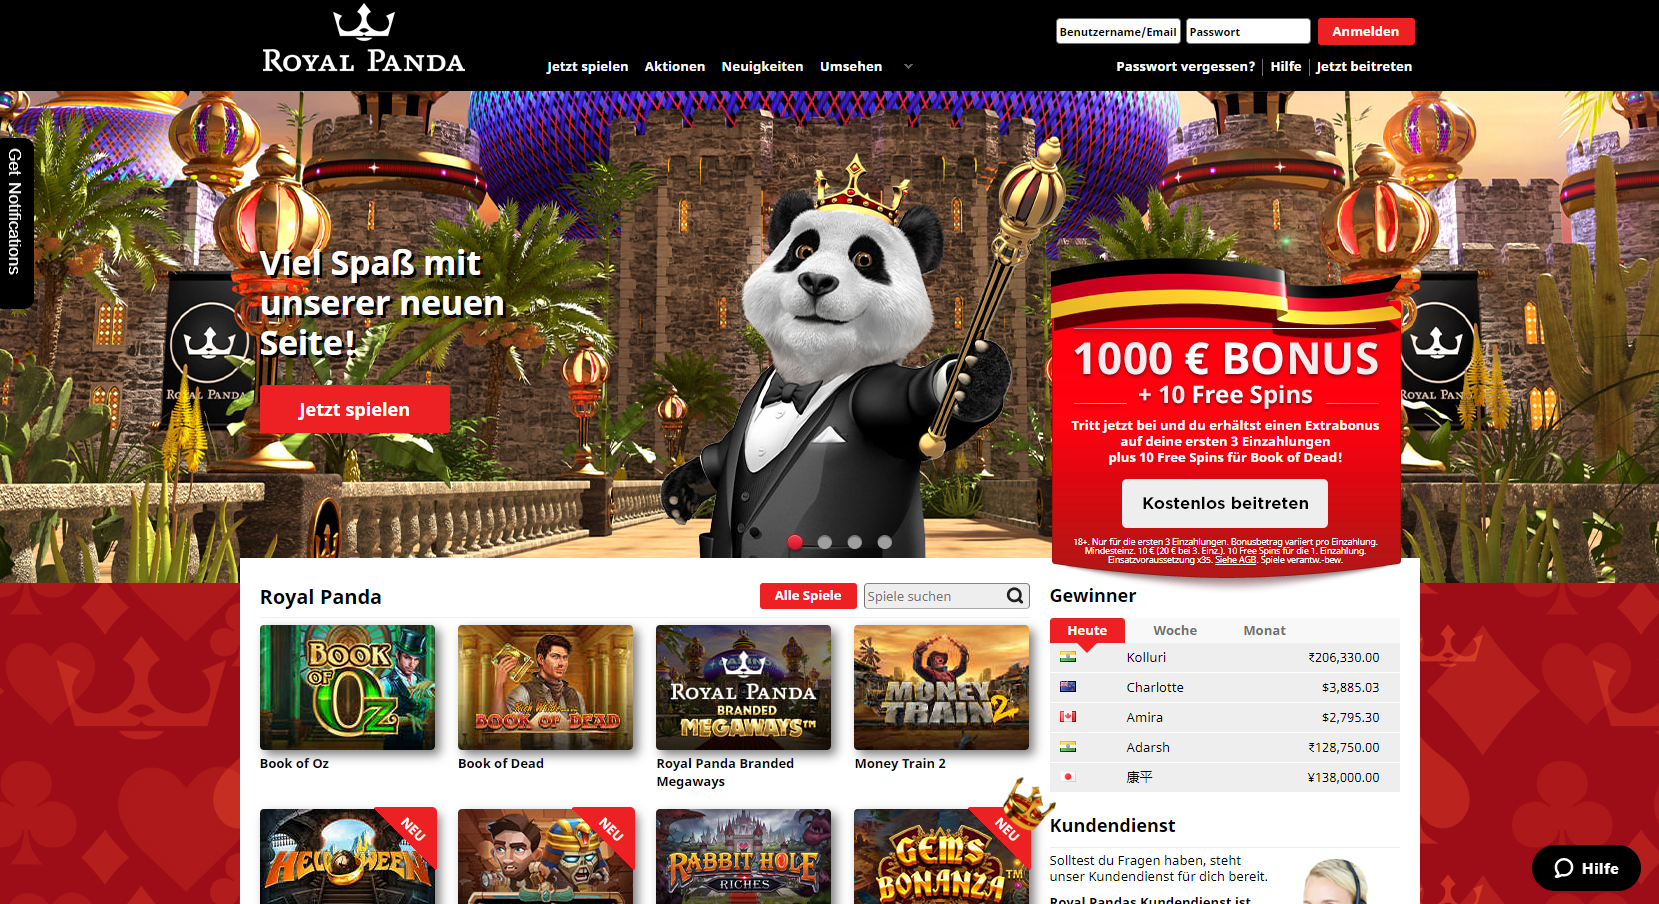 Royal Panda Online-Spielothek